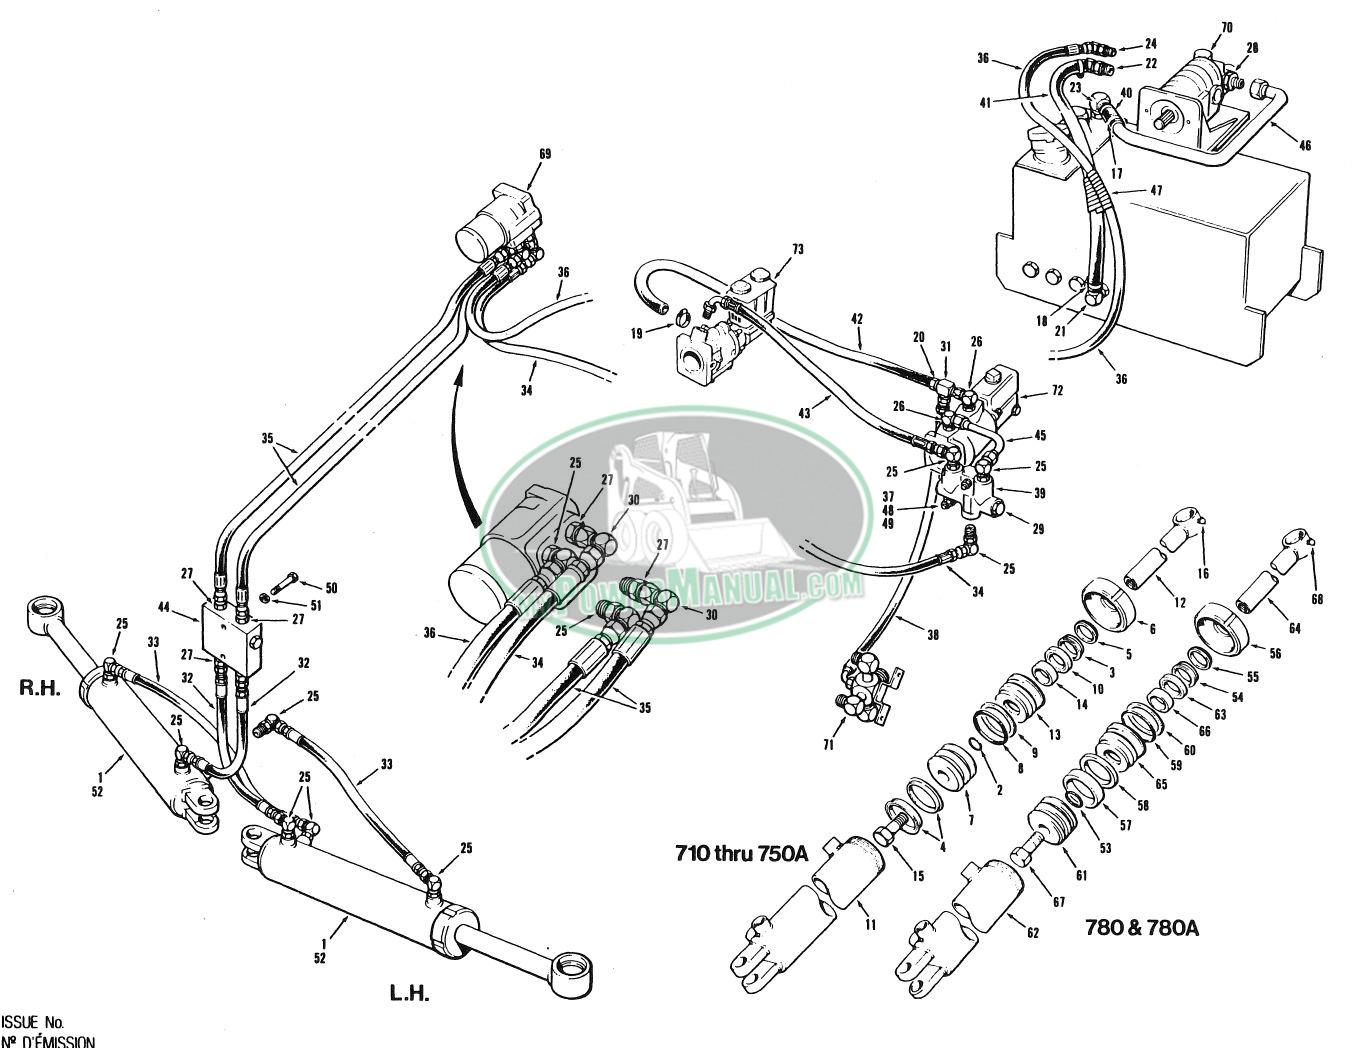 fiat allis 65 b wiring diagram schematic diagrams fiat 130 champion 710a  motor grader wiring diagram